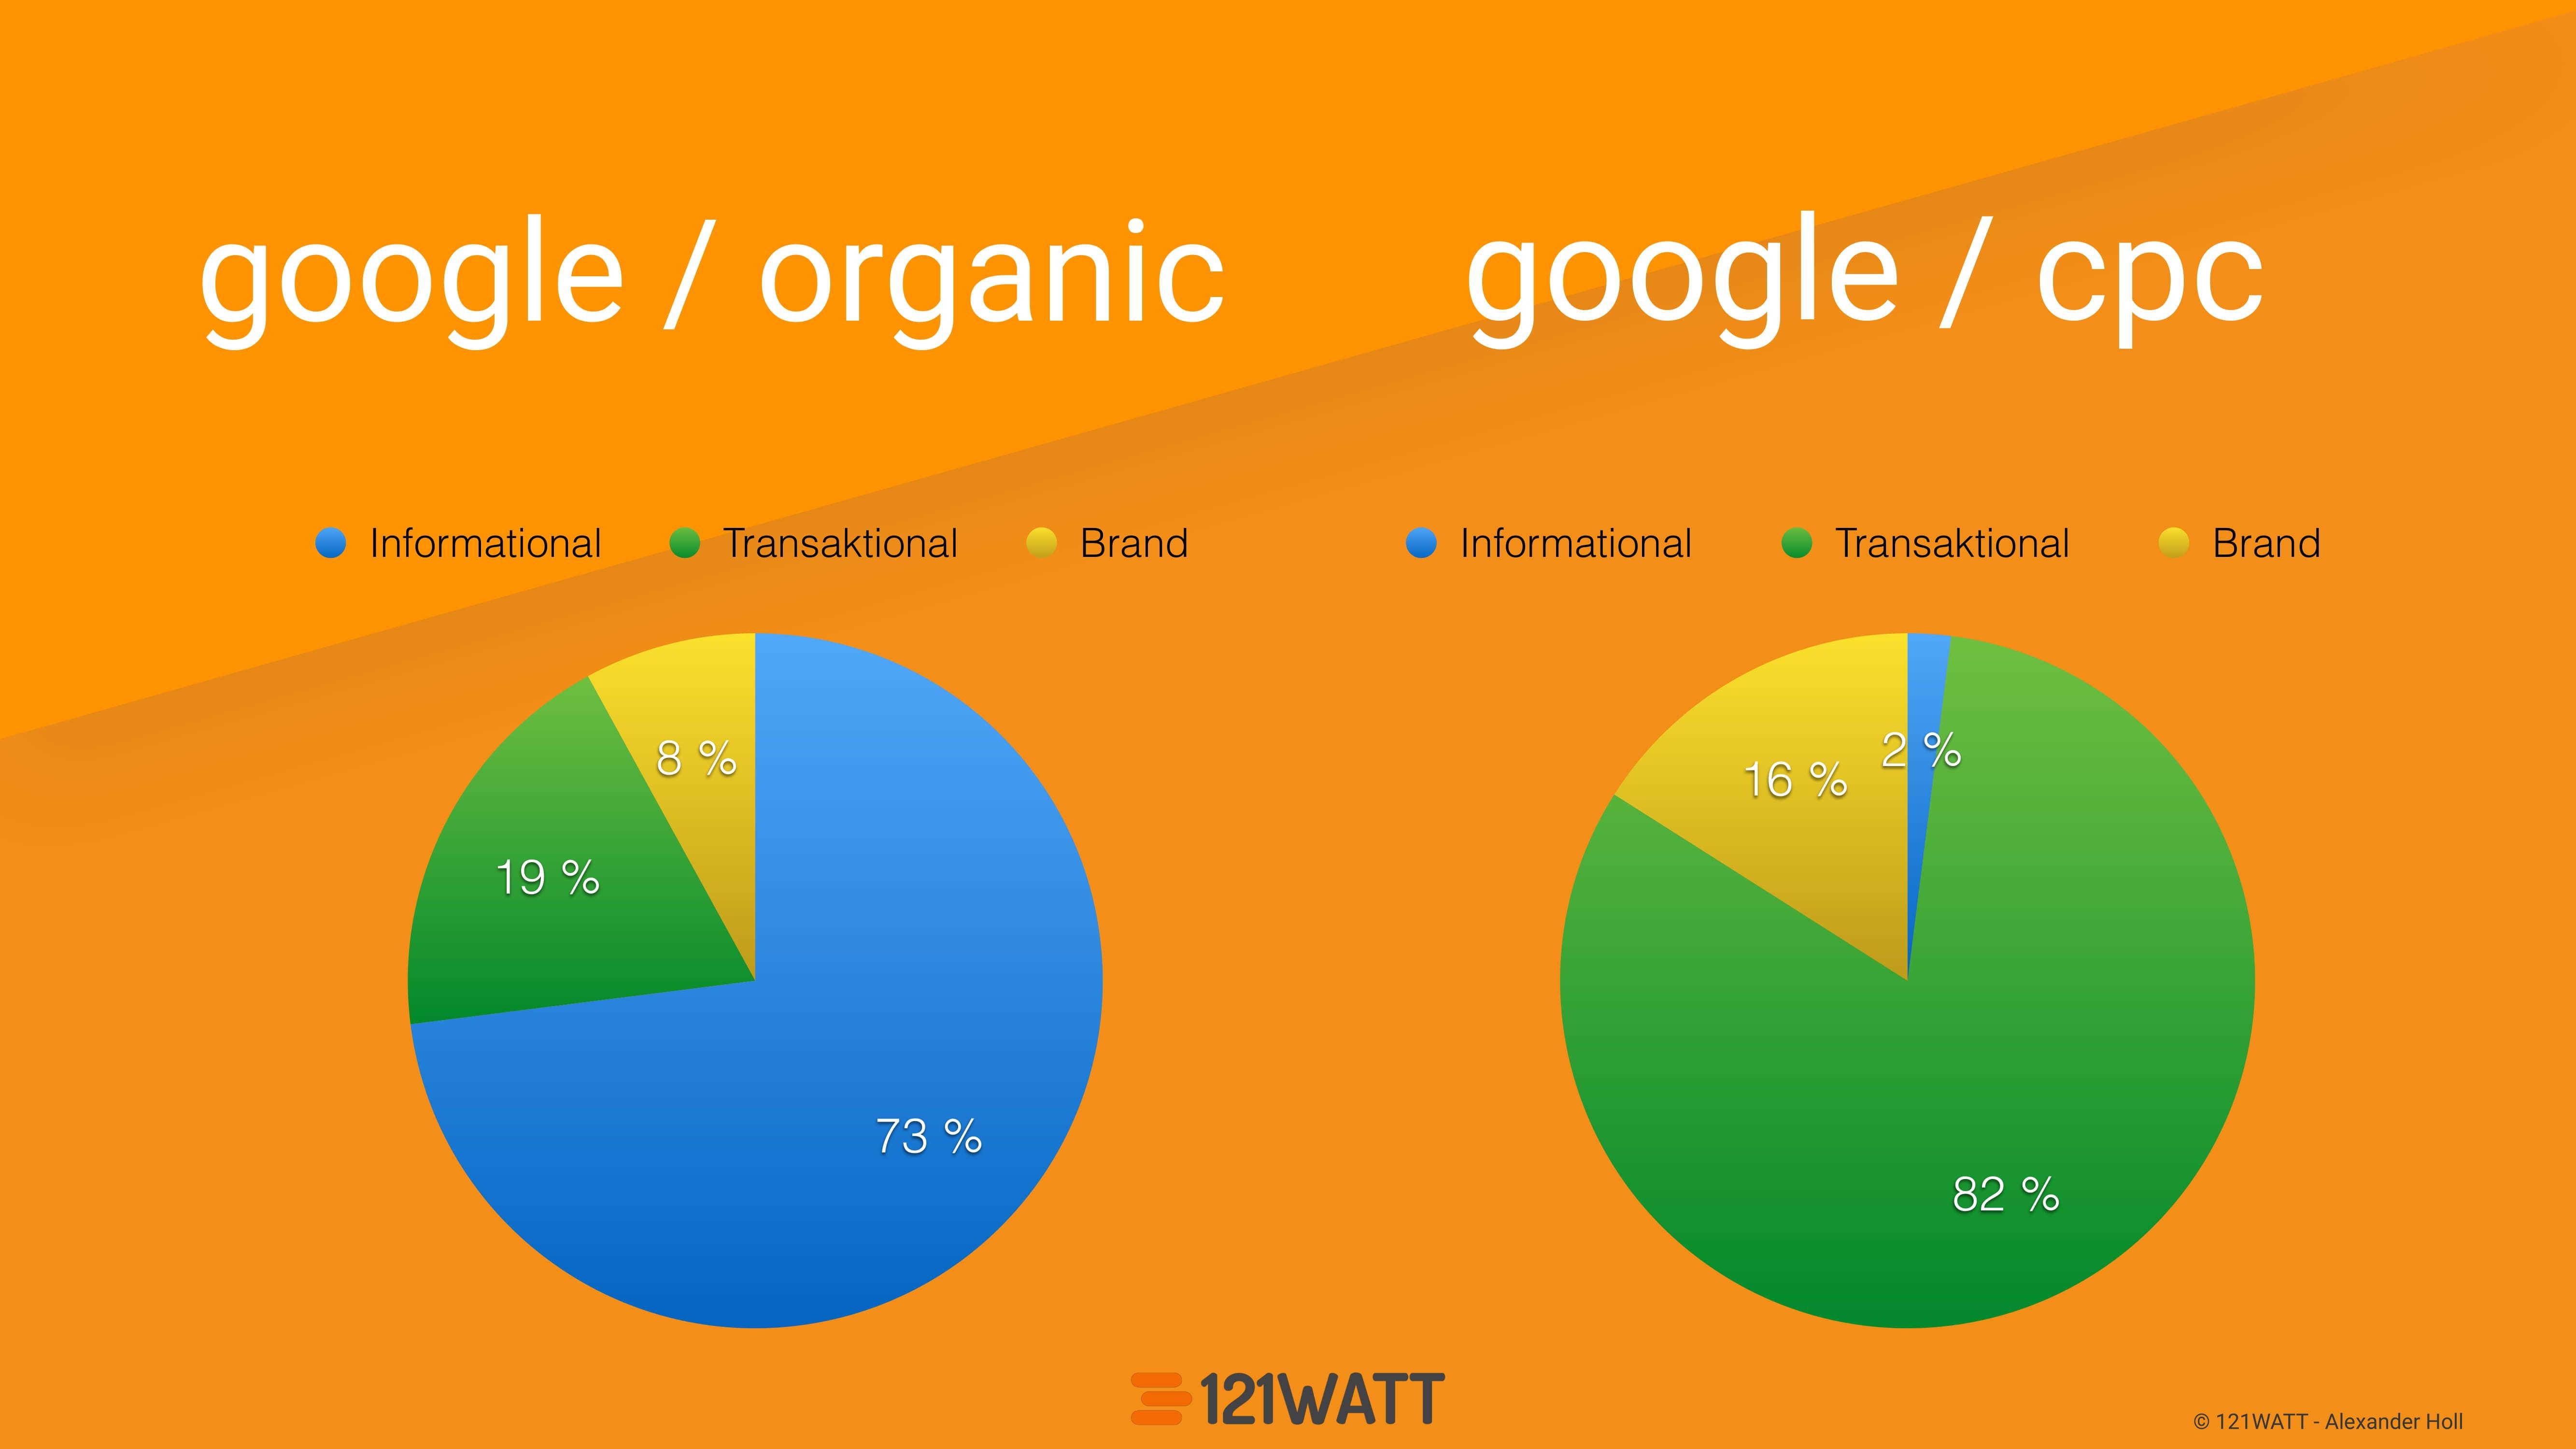 google-analytics-fortgeschrittene-segmentierungsstrategien-seo-day-short-version2-16.jpg